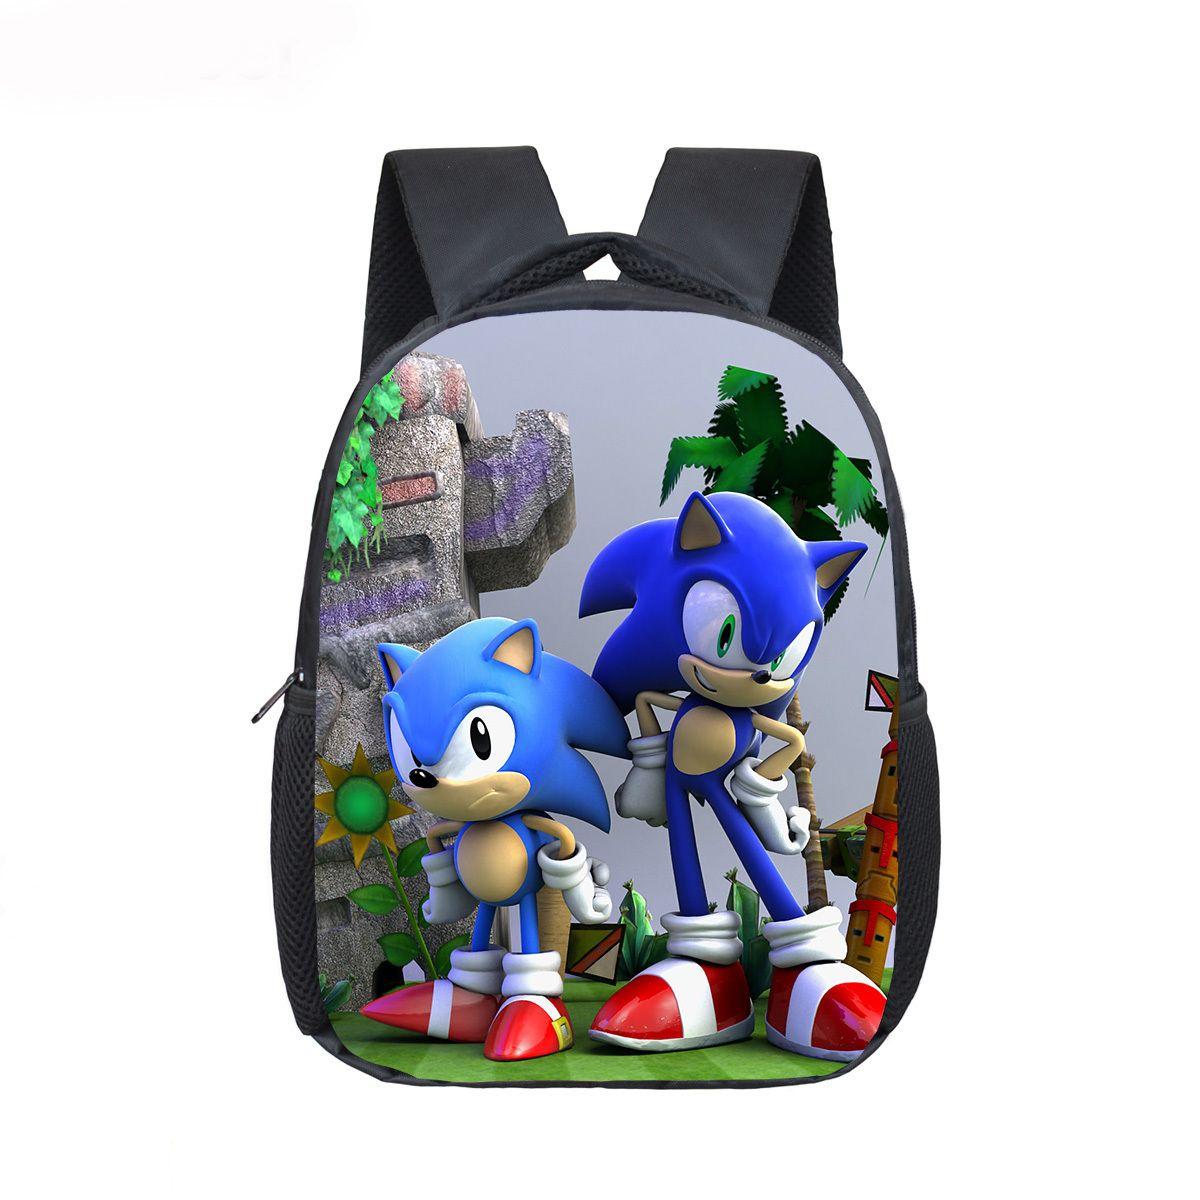 12 Inch Mario Bros Sonic Boom Hedgehogs Kindergarten School Bags Bookbags Children Baby Toddler Bag Kids Backpack Gift Backpacks For Teens Cheap Backpacks From Weitaotao 49 85 Dhgate Com